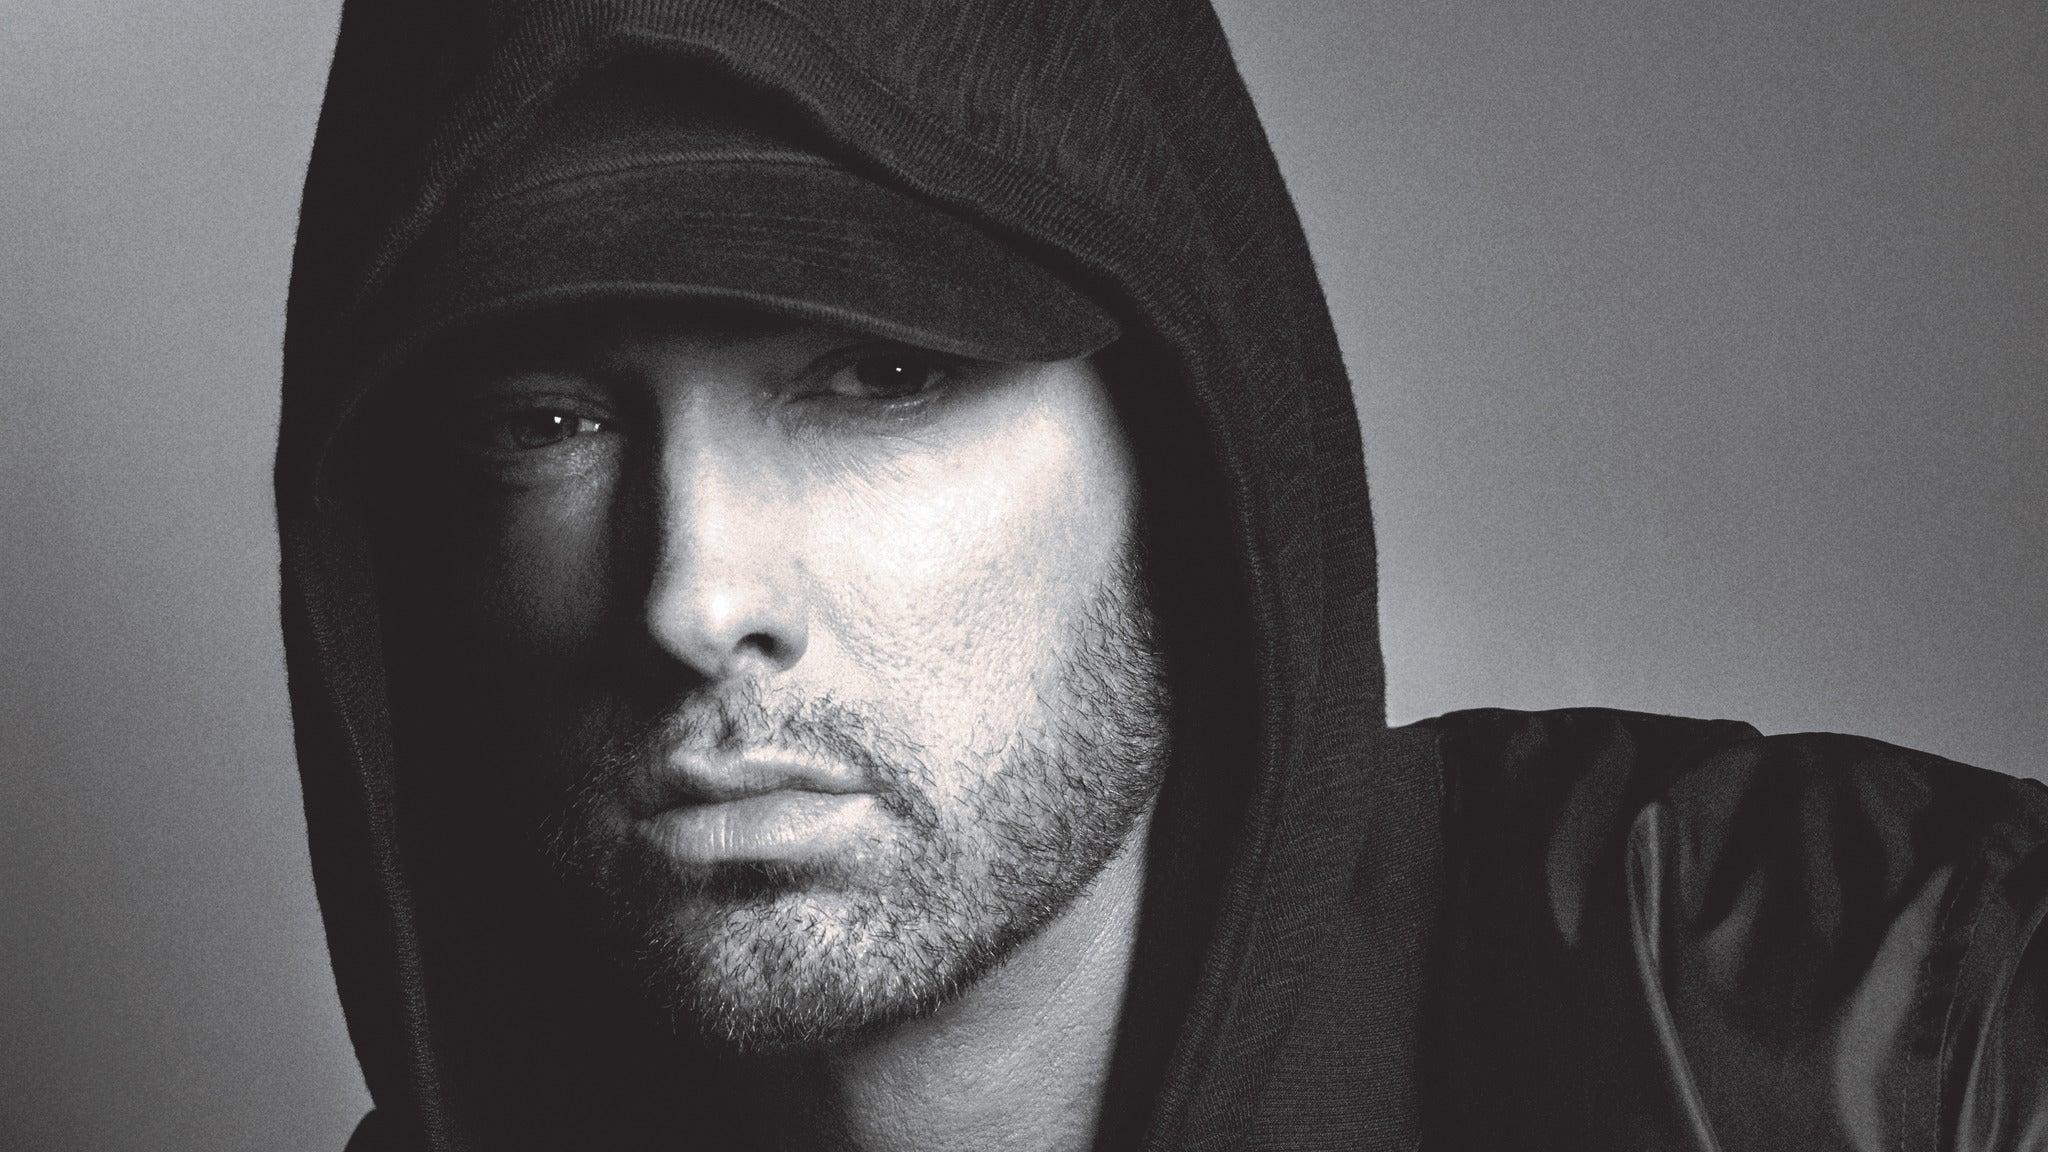 Eminem Tour 2020.Eminem Tickets Eminem Concert Tickets Tour Dates